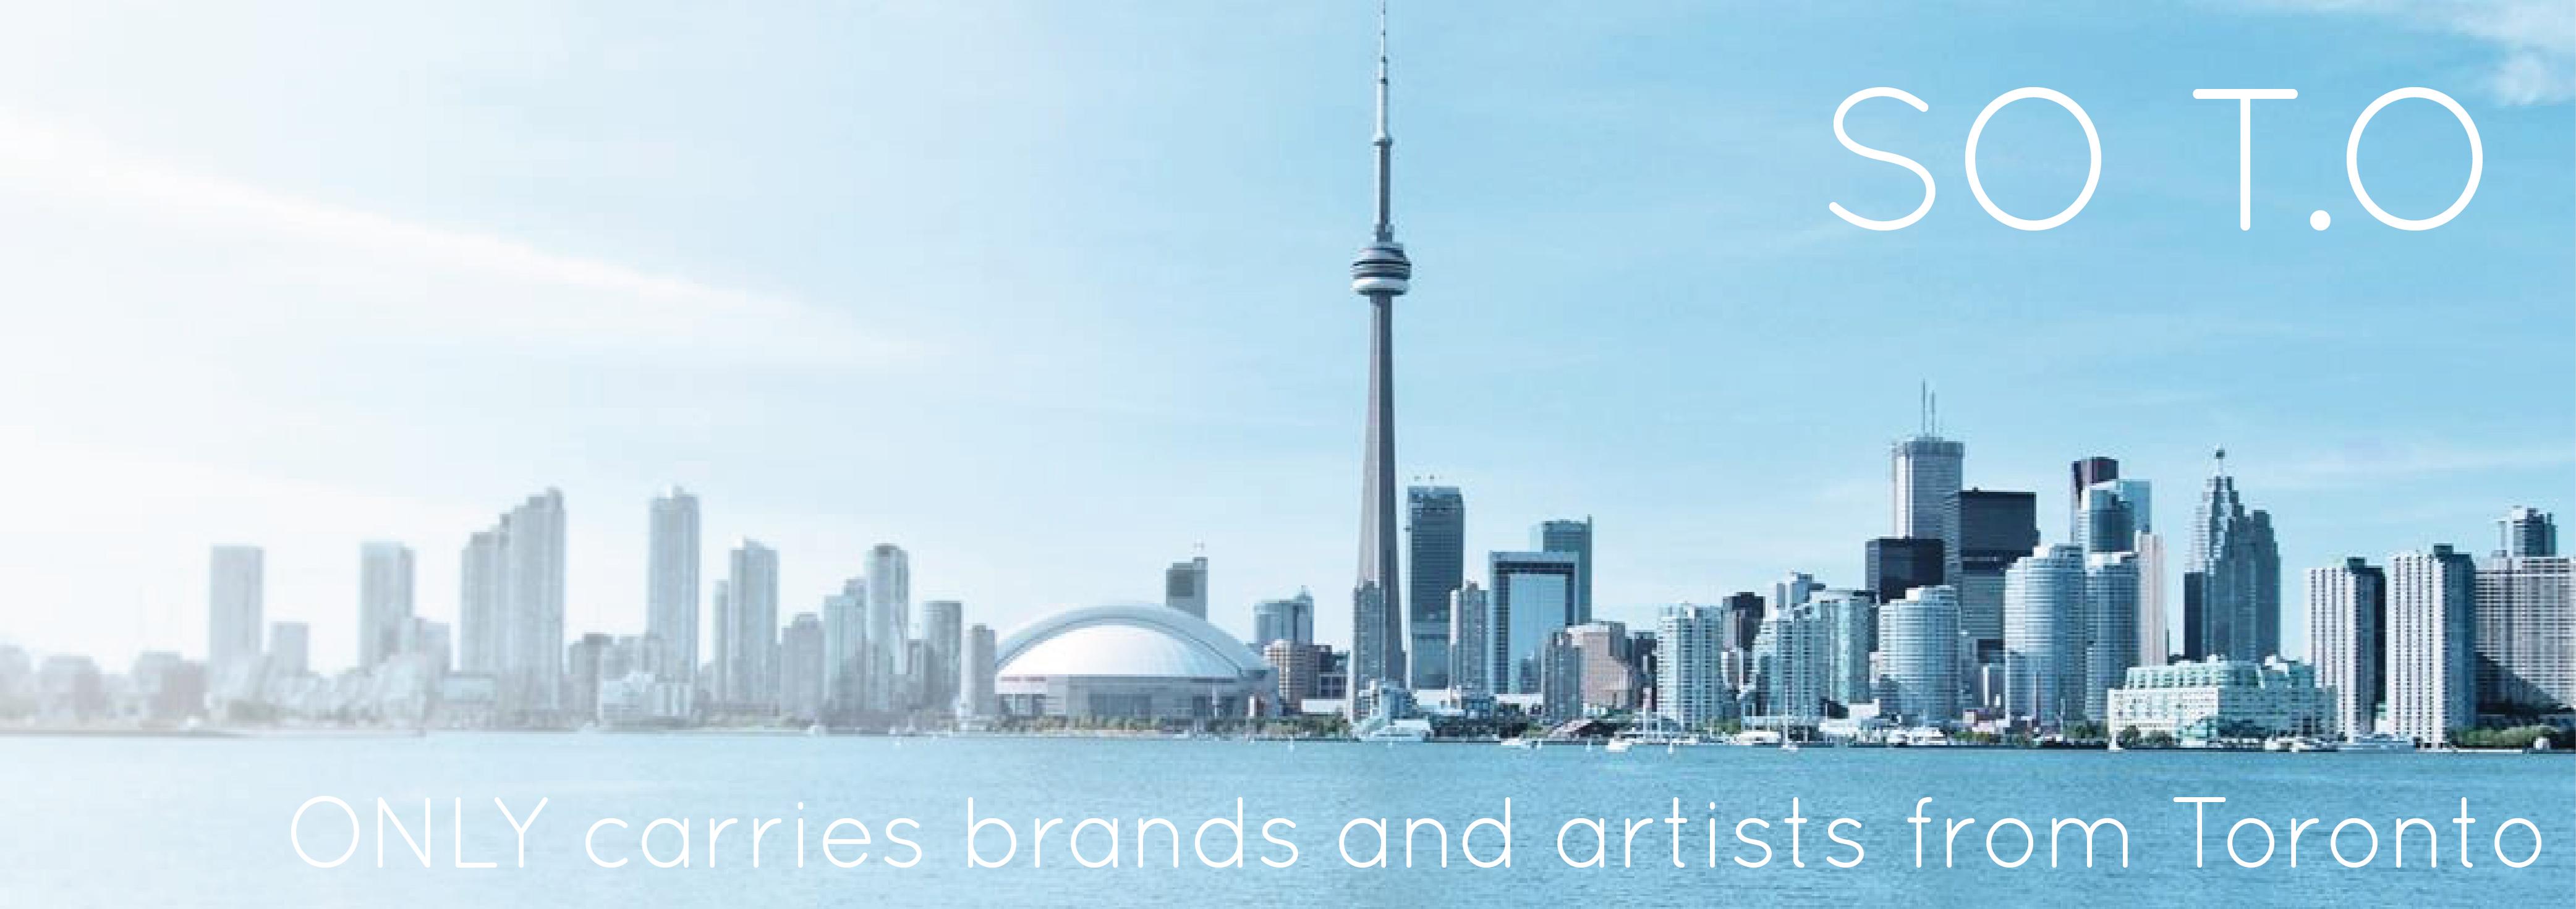 SO_Toronto_shop_local_brands_online-01